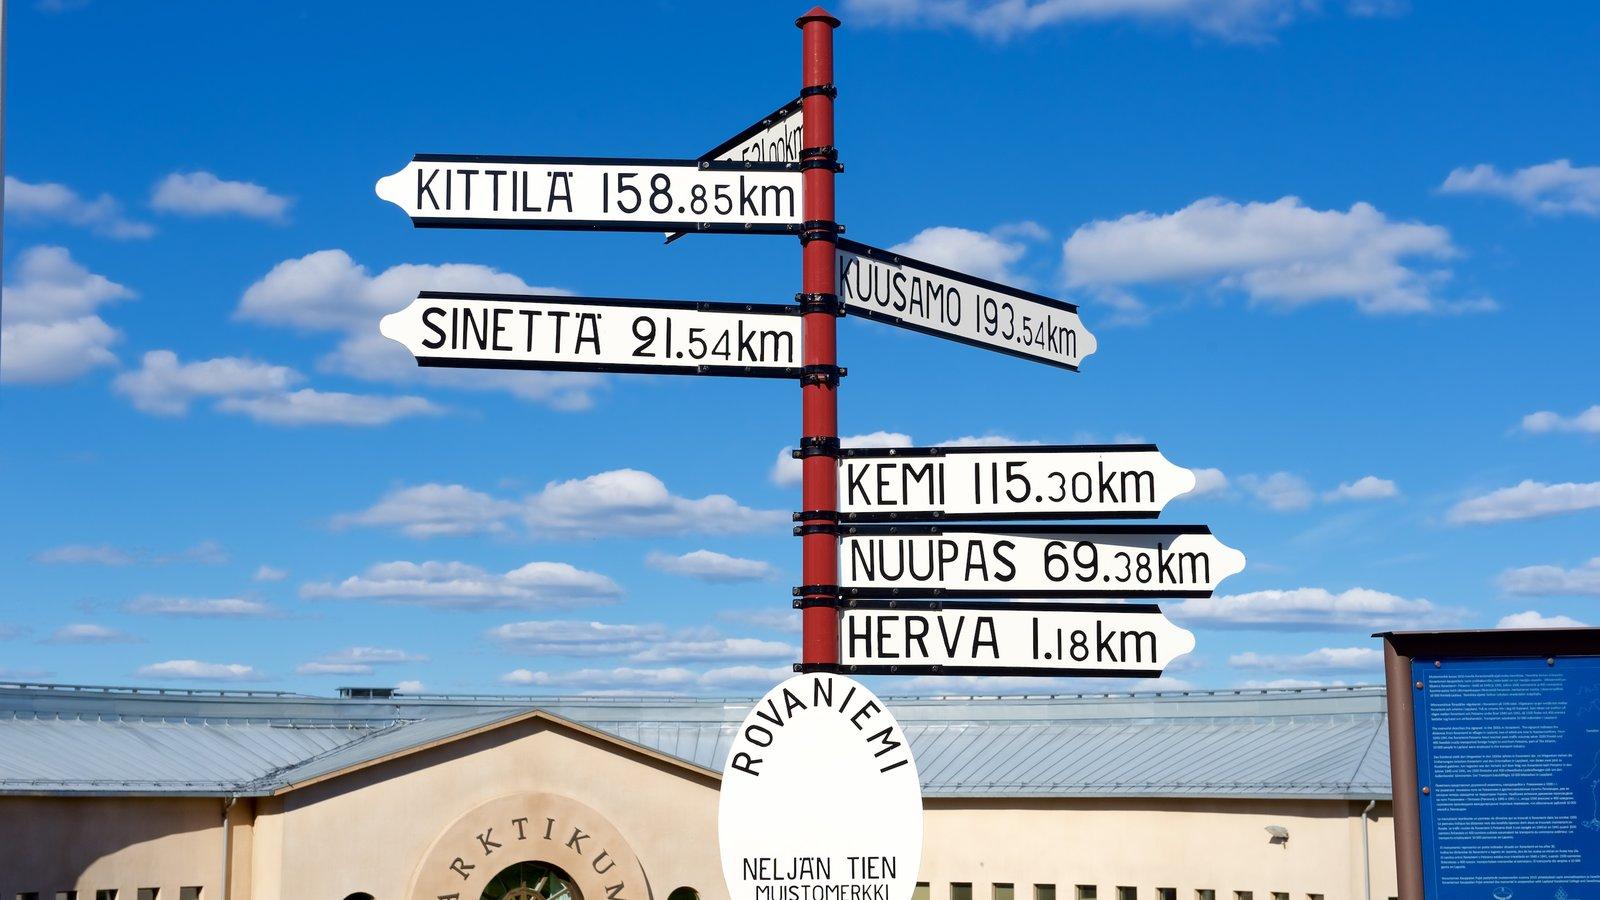 Arktikum which includes signage